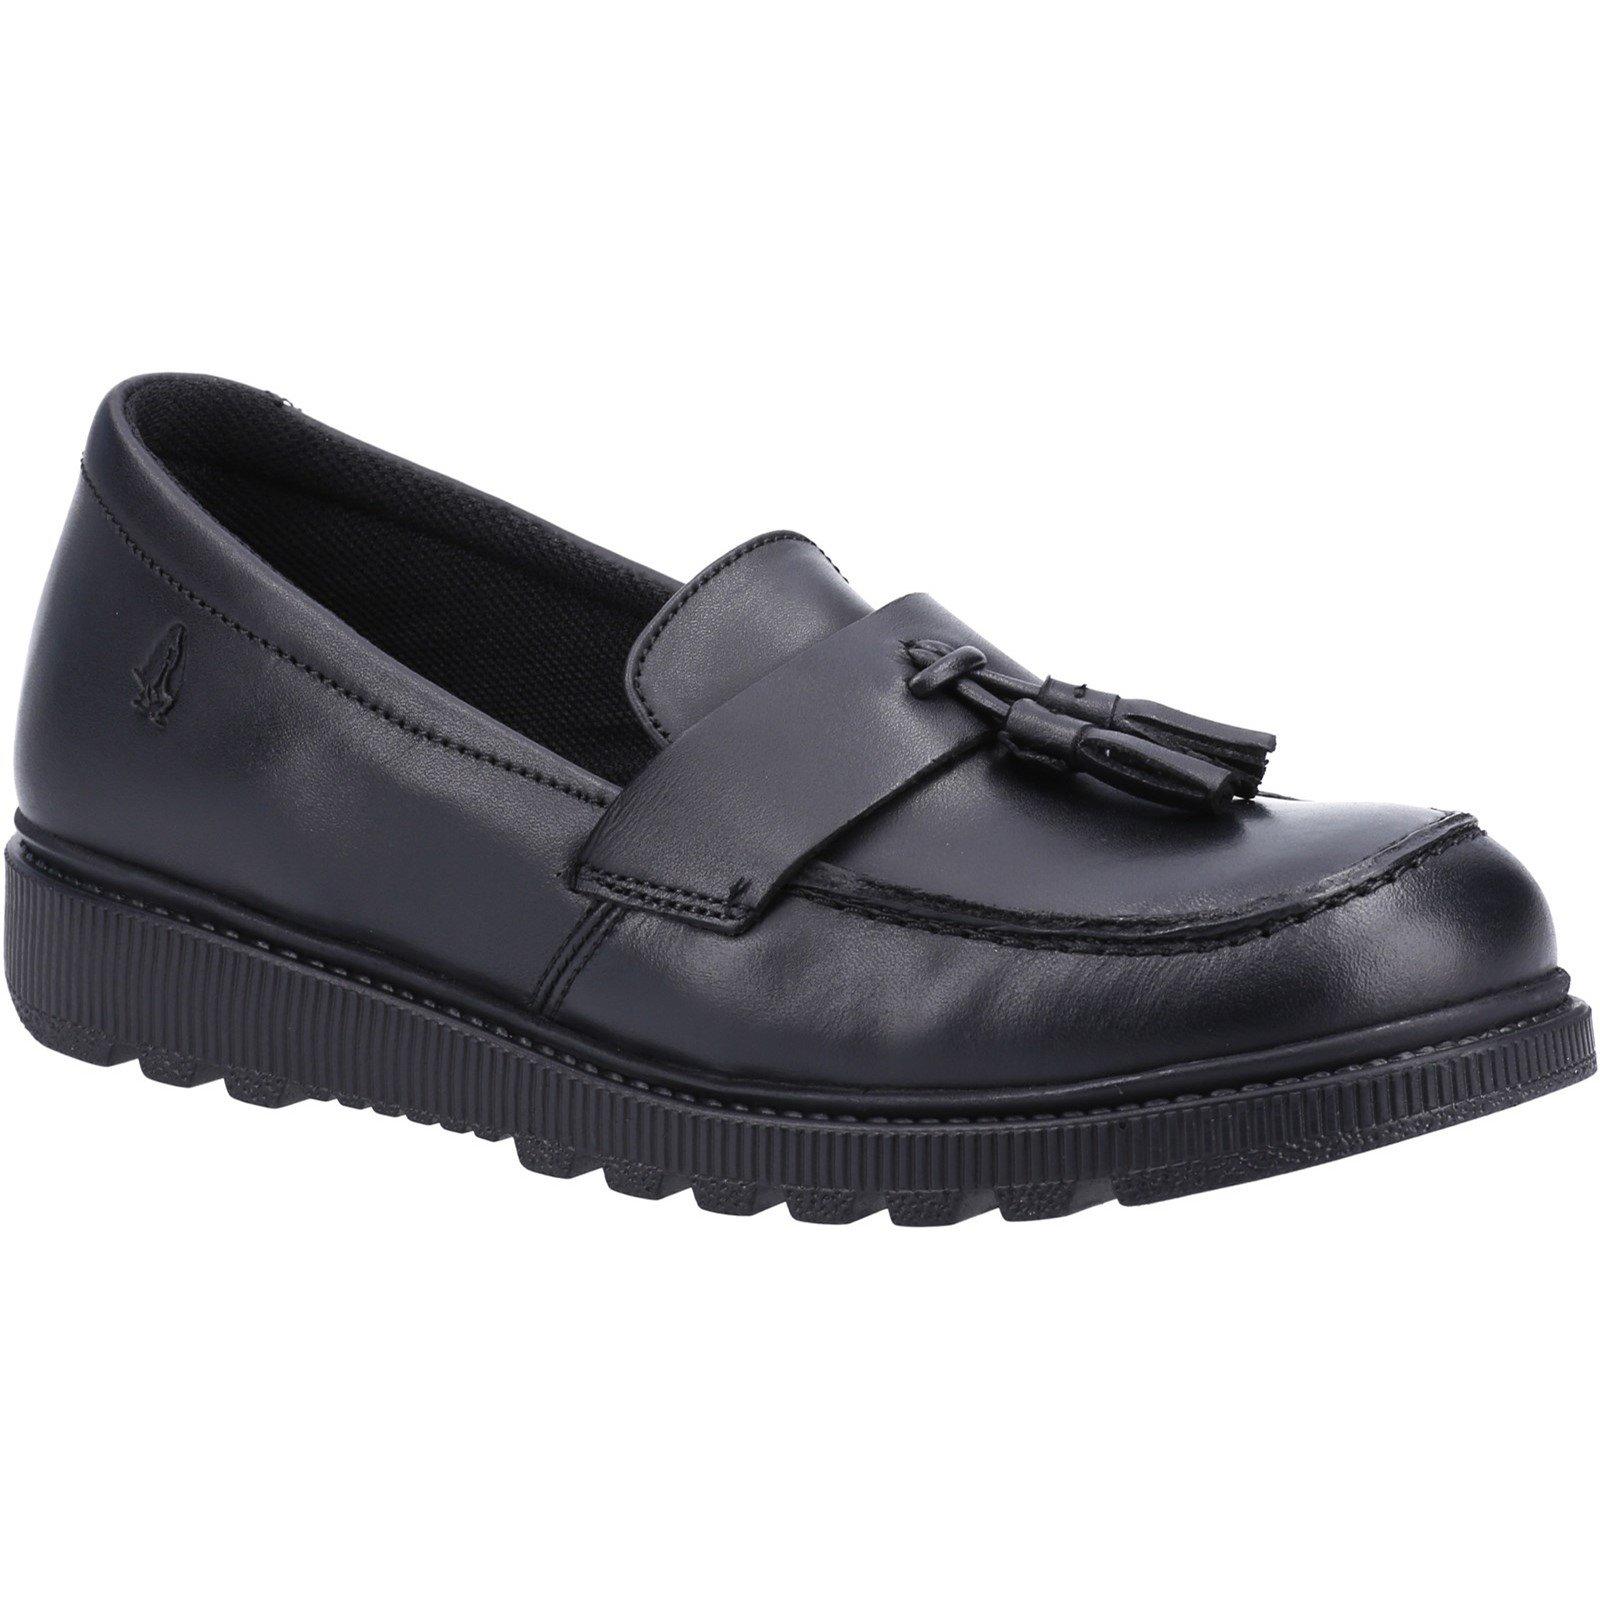 Hush Puppies Kid's Faye Junior School Shoe Black 30843 - Black 13